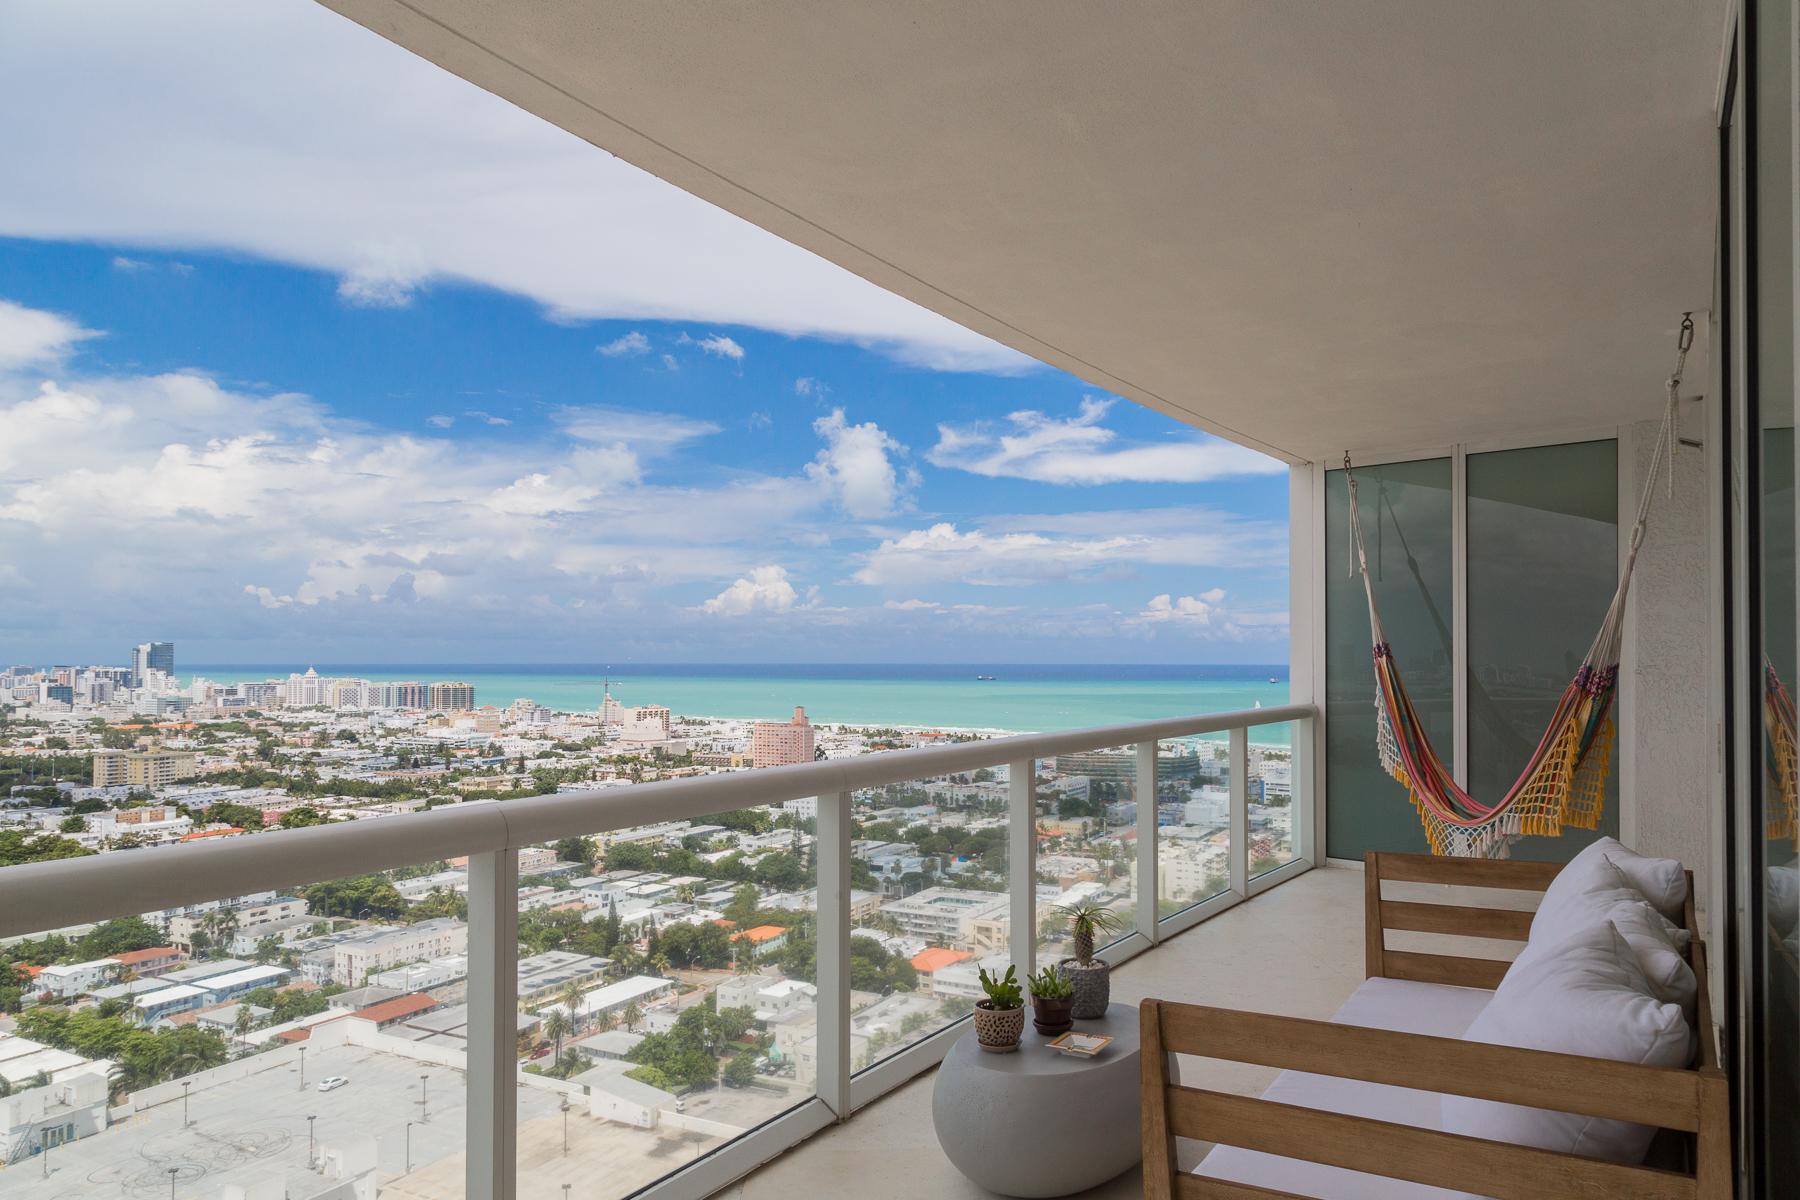 Condominium for Sale at 450 Alton Rd #3106 450 Alton Rd 3106 Miami Beach, Florida, 33139 United States